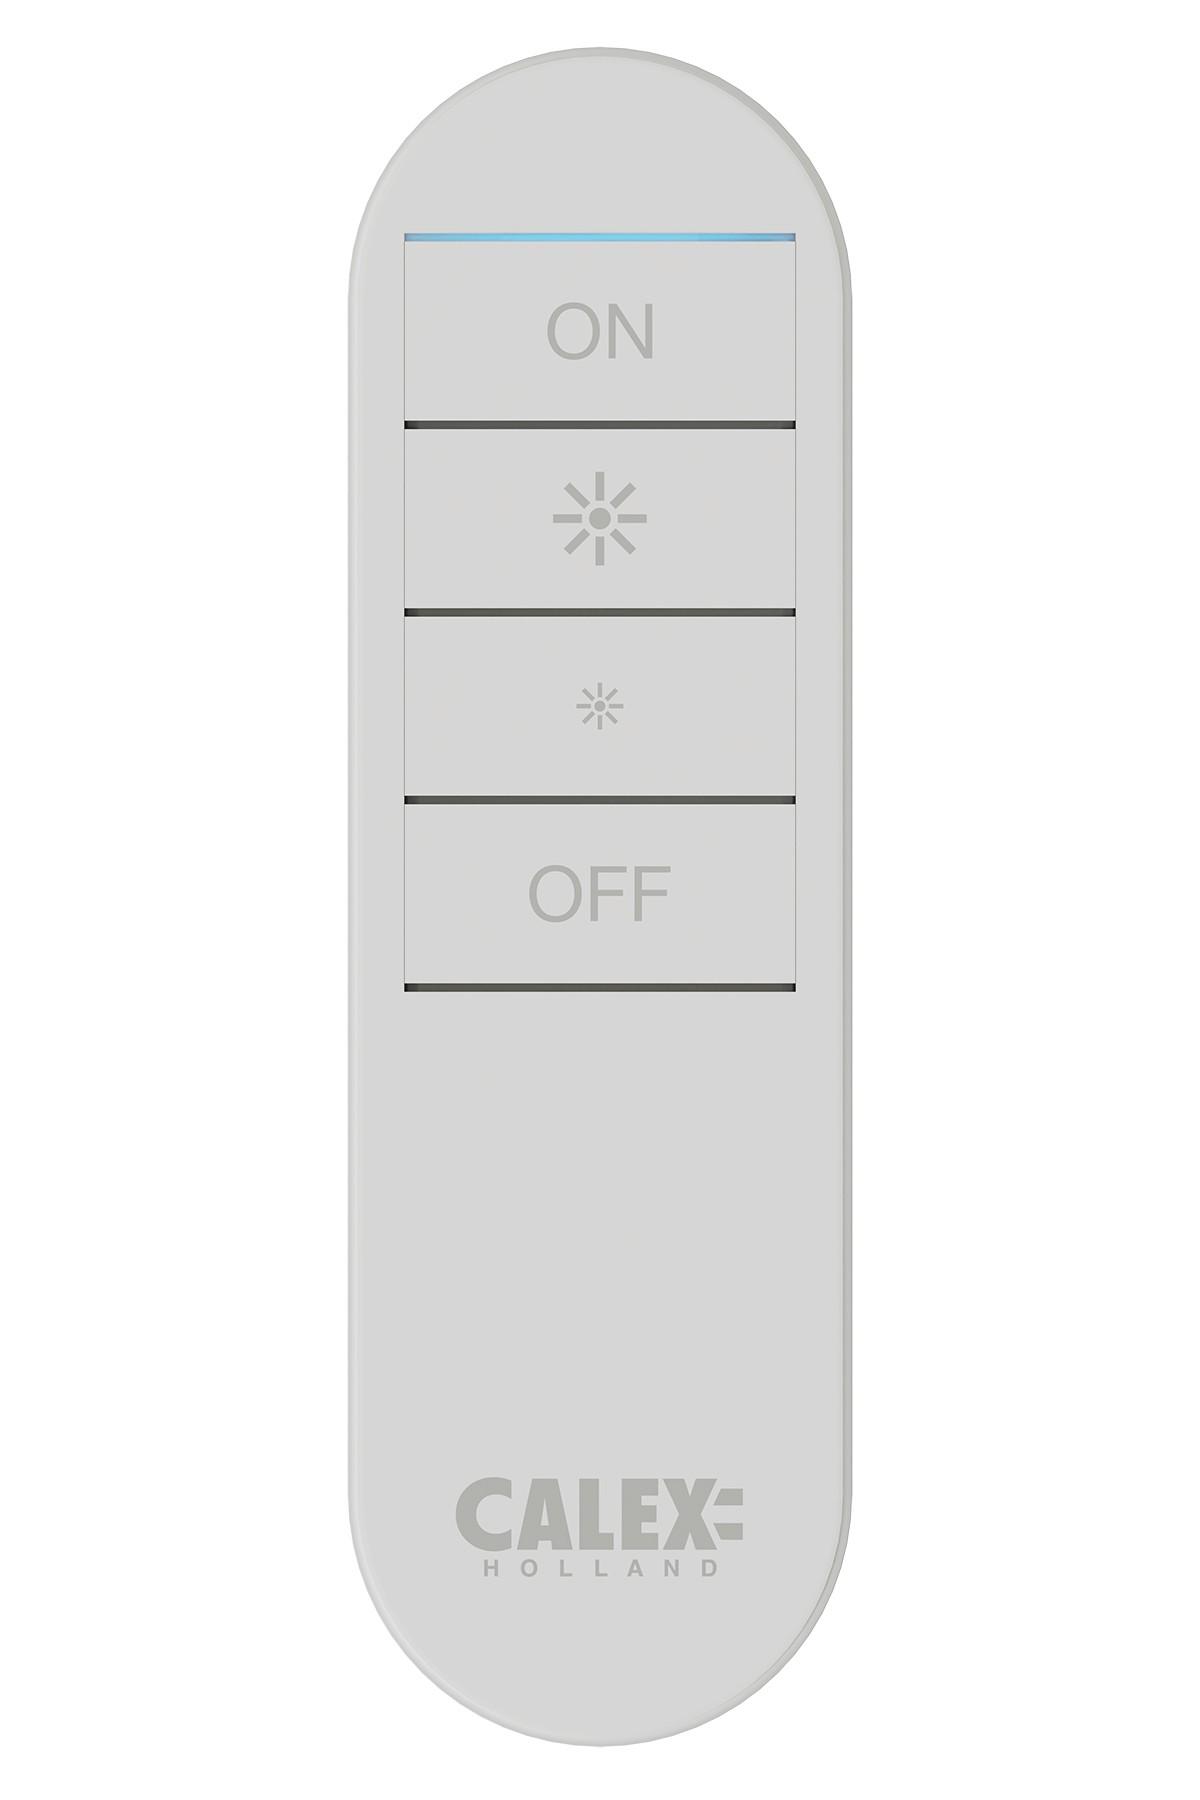 Calex Smart Remote Control